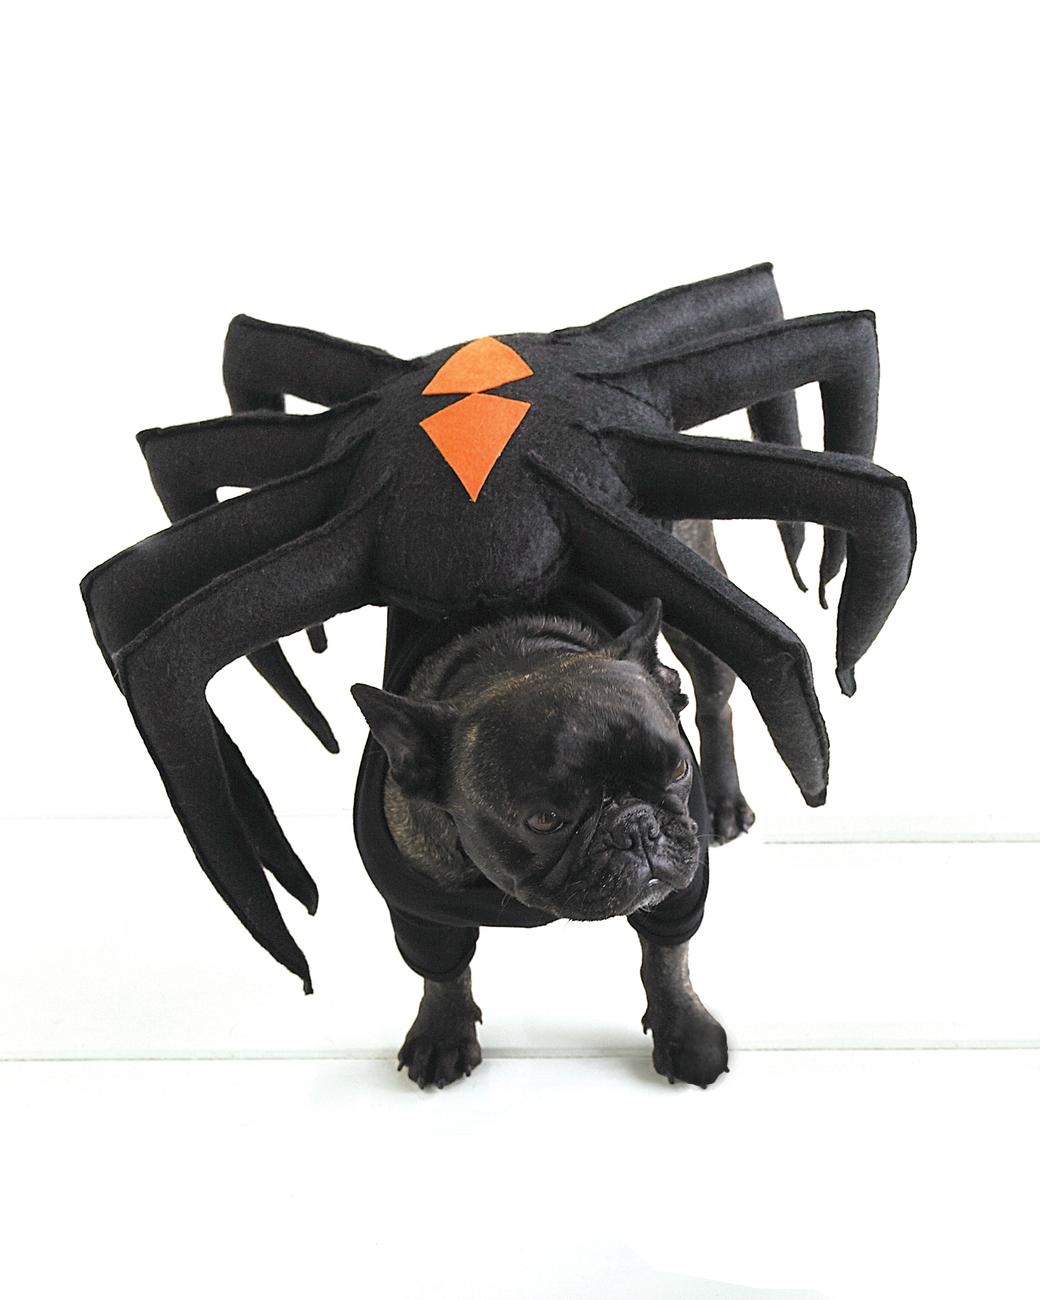 Dog dressed in spider Halloween costume